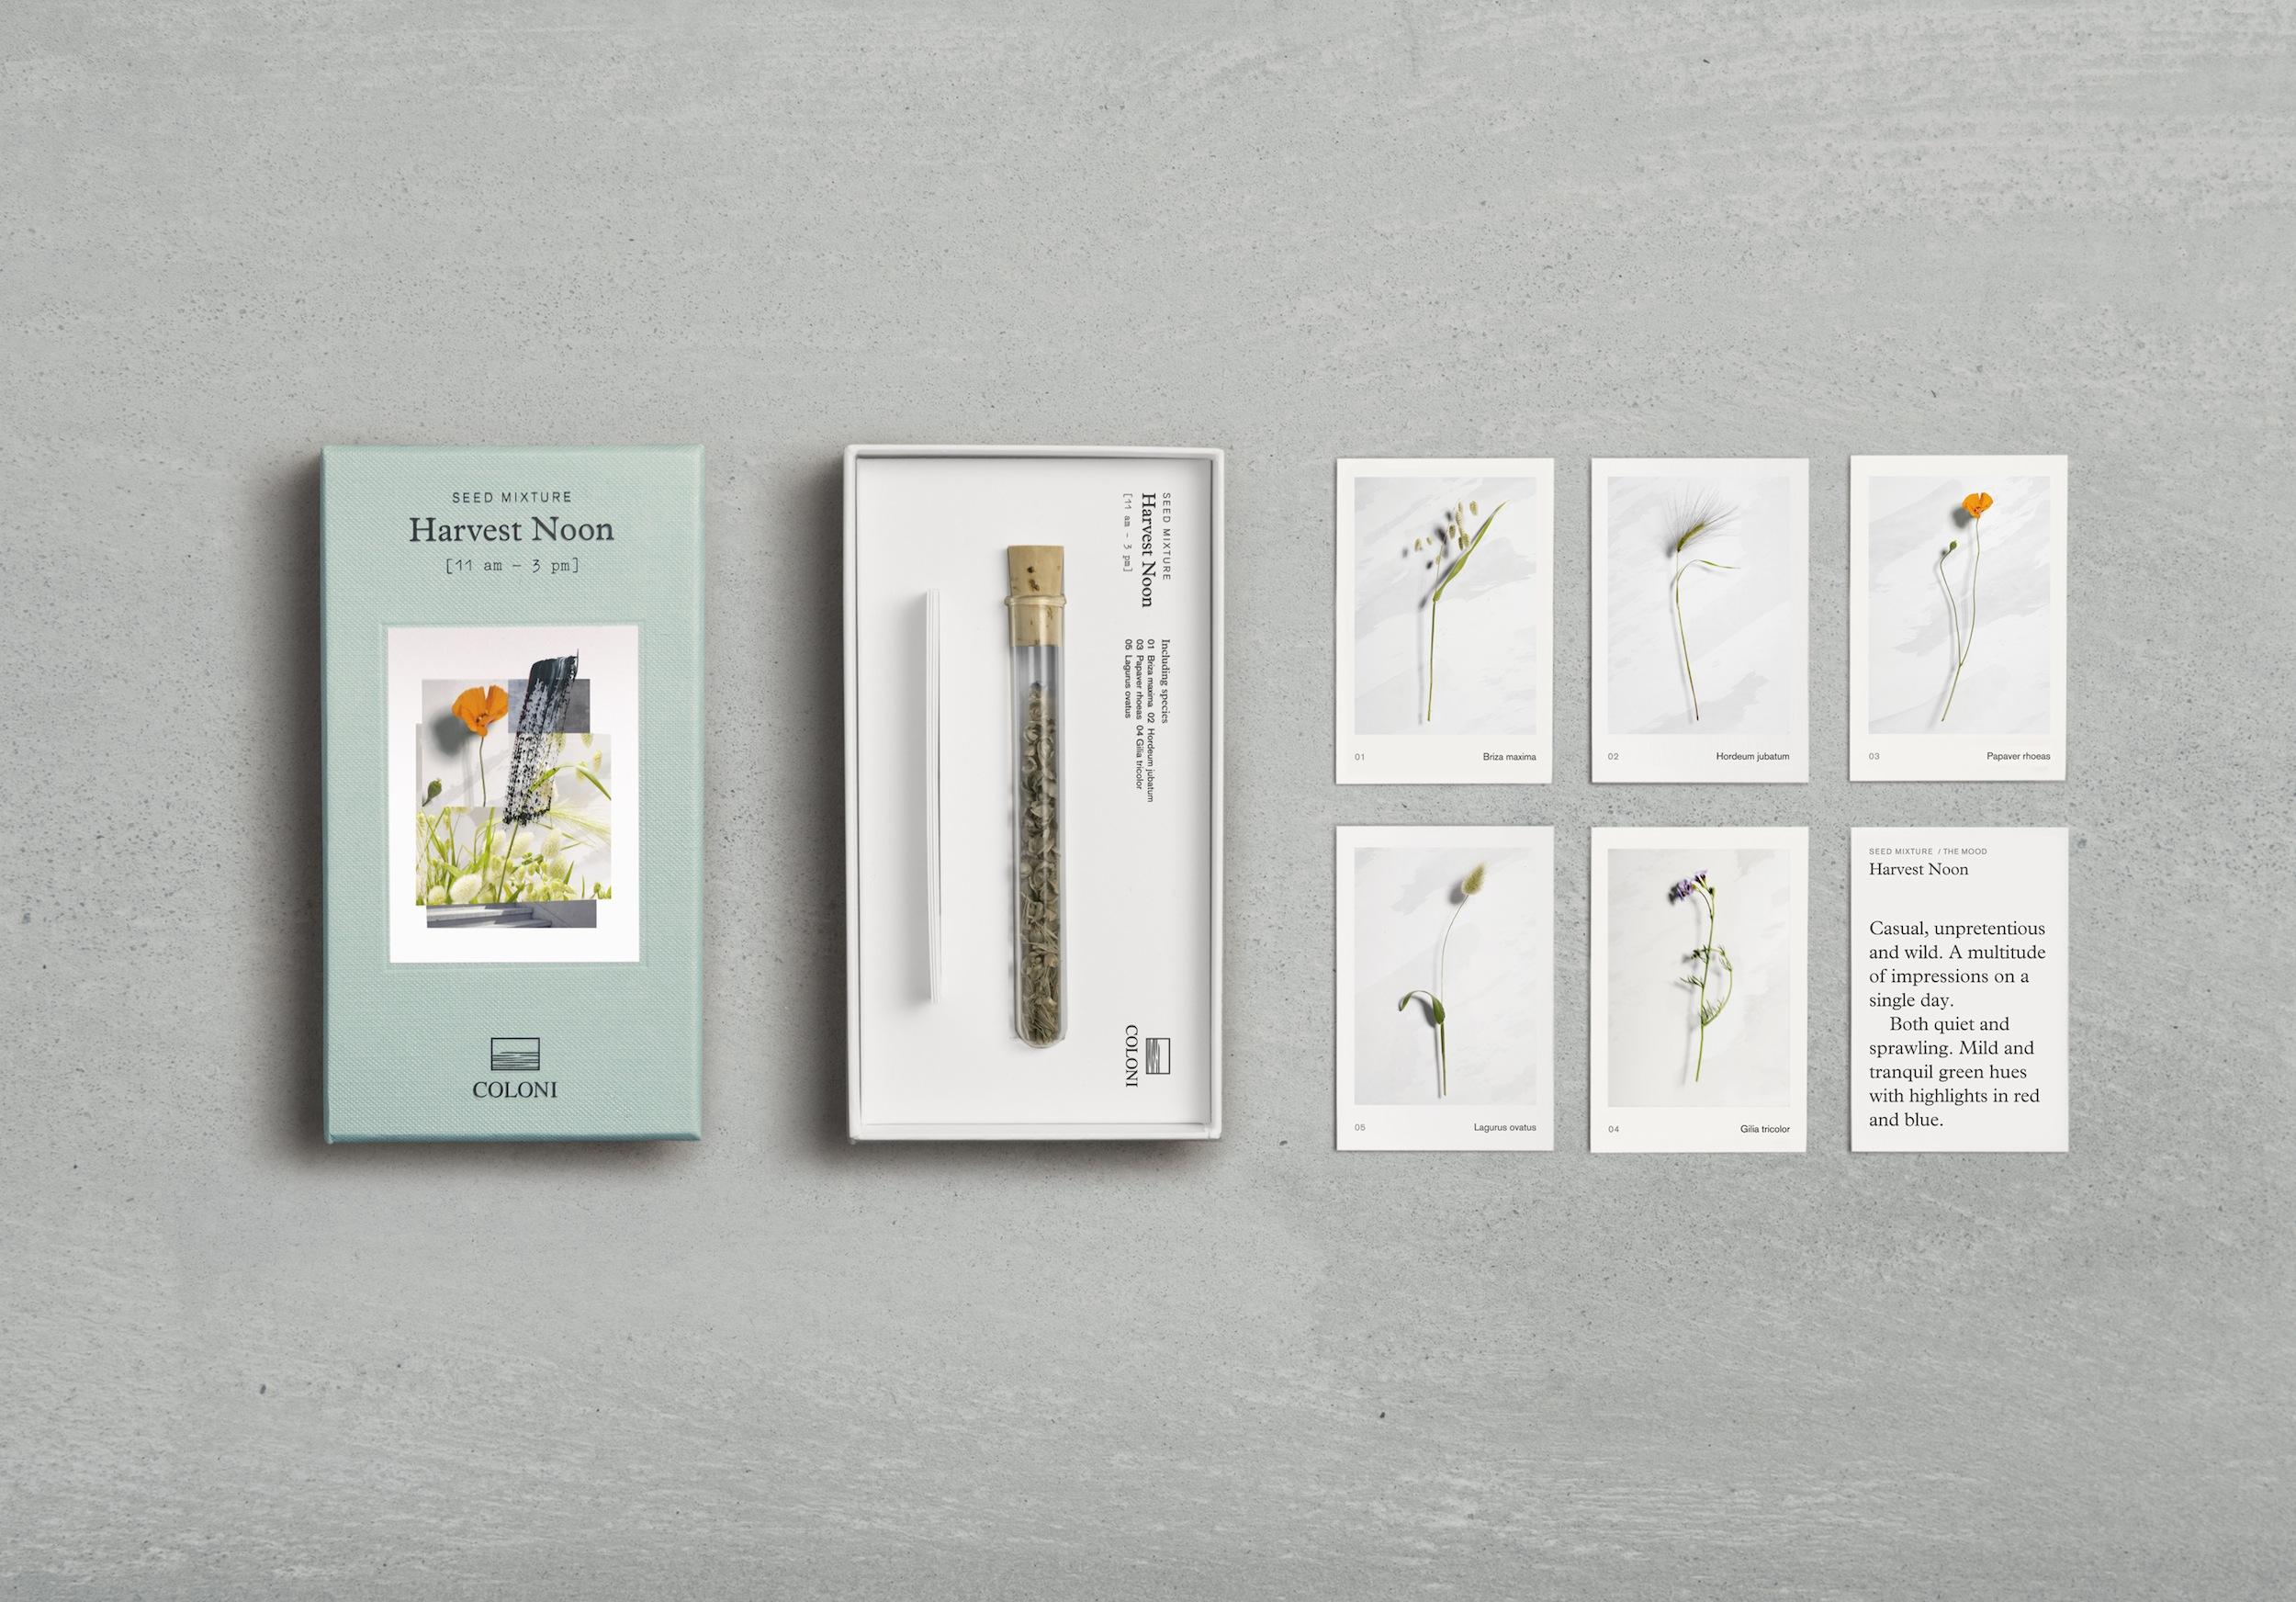 coloni-swedish-based-gardening-house-1.jpg